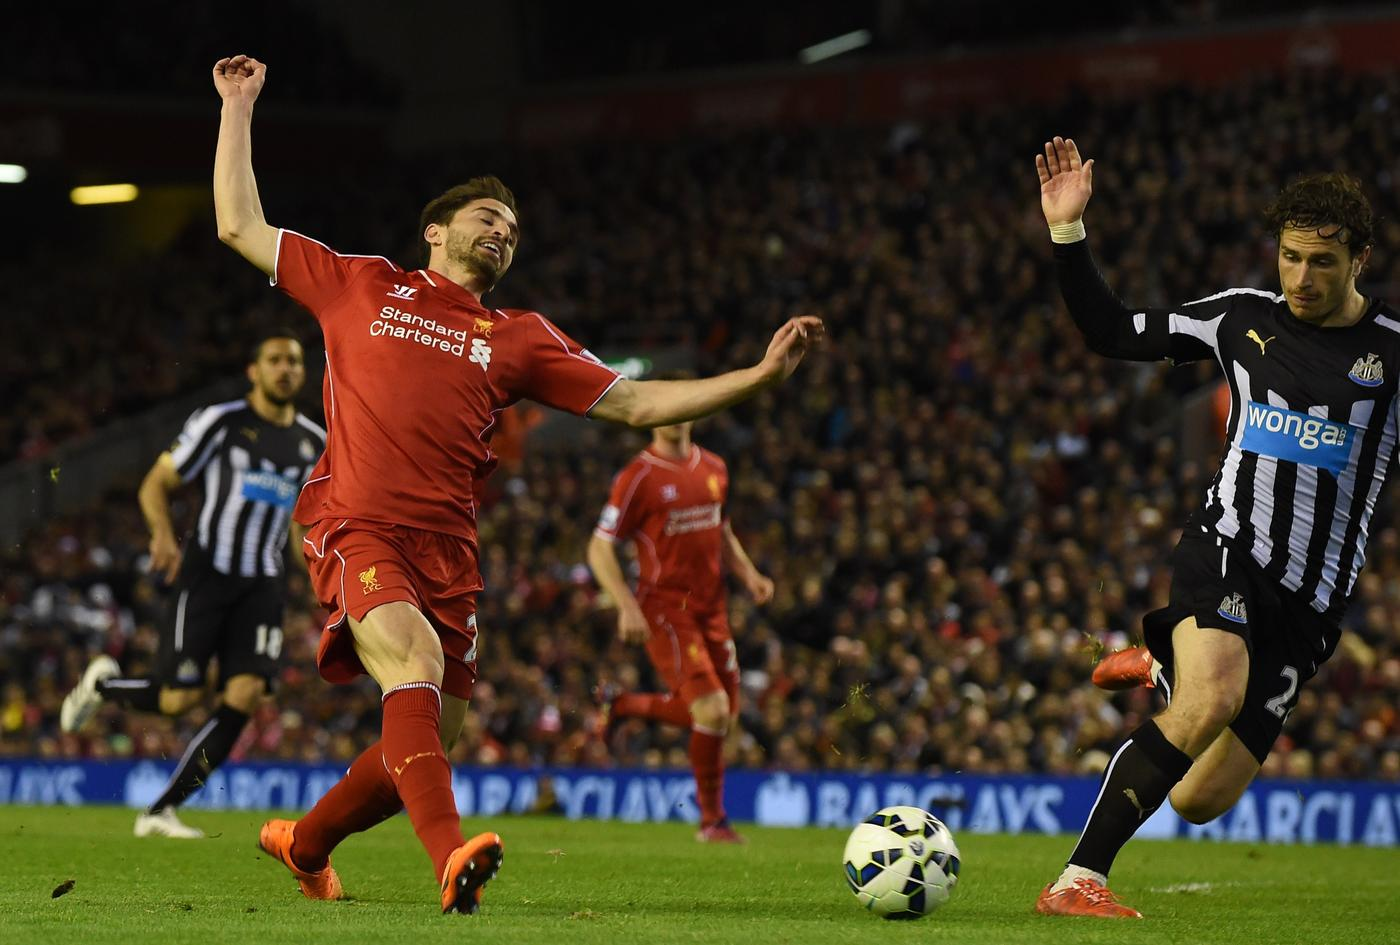 Fabio Borini seeking transfer away from Liverpool, says his agent